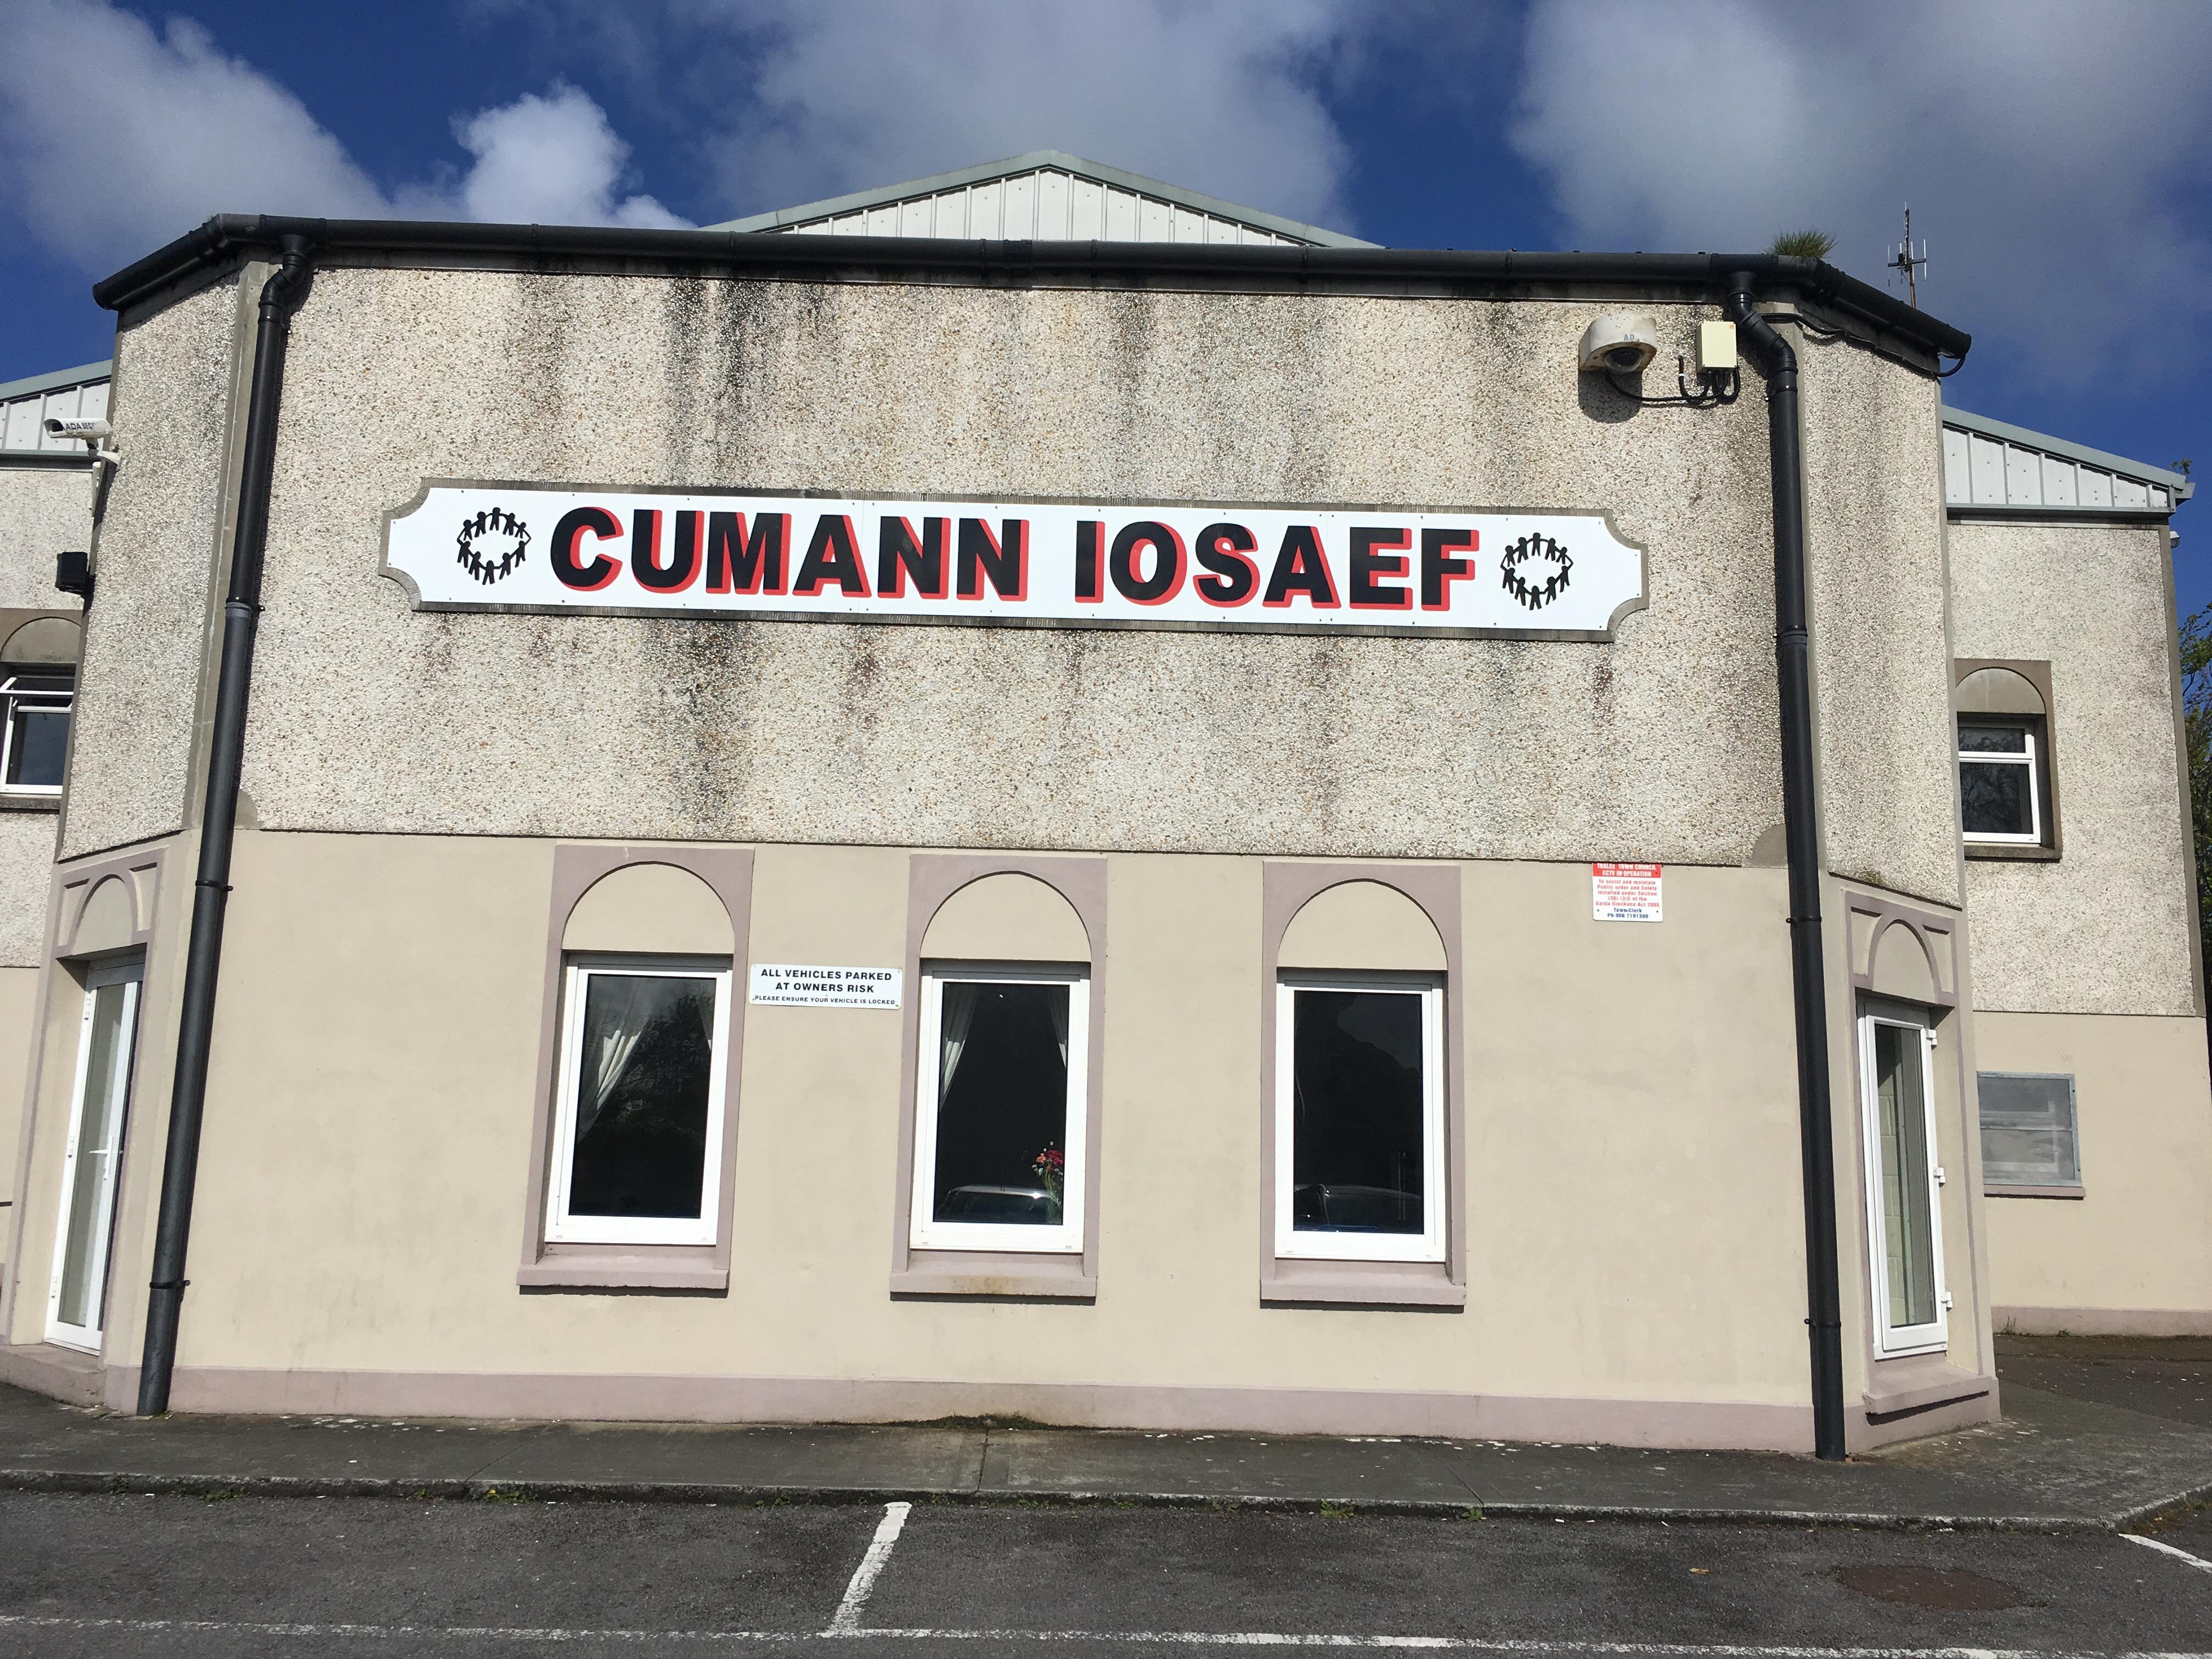 Cumann Iosaef Gallery Post